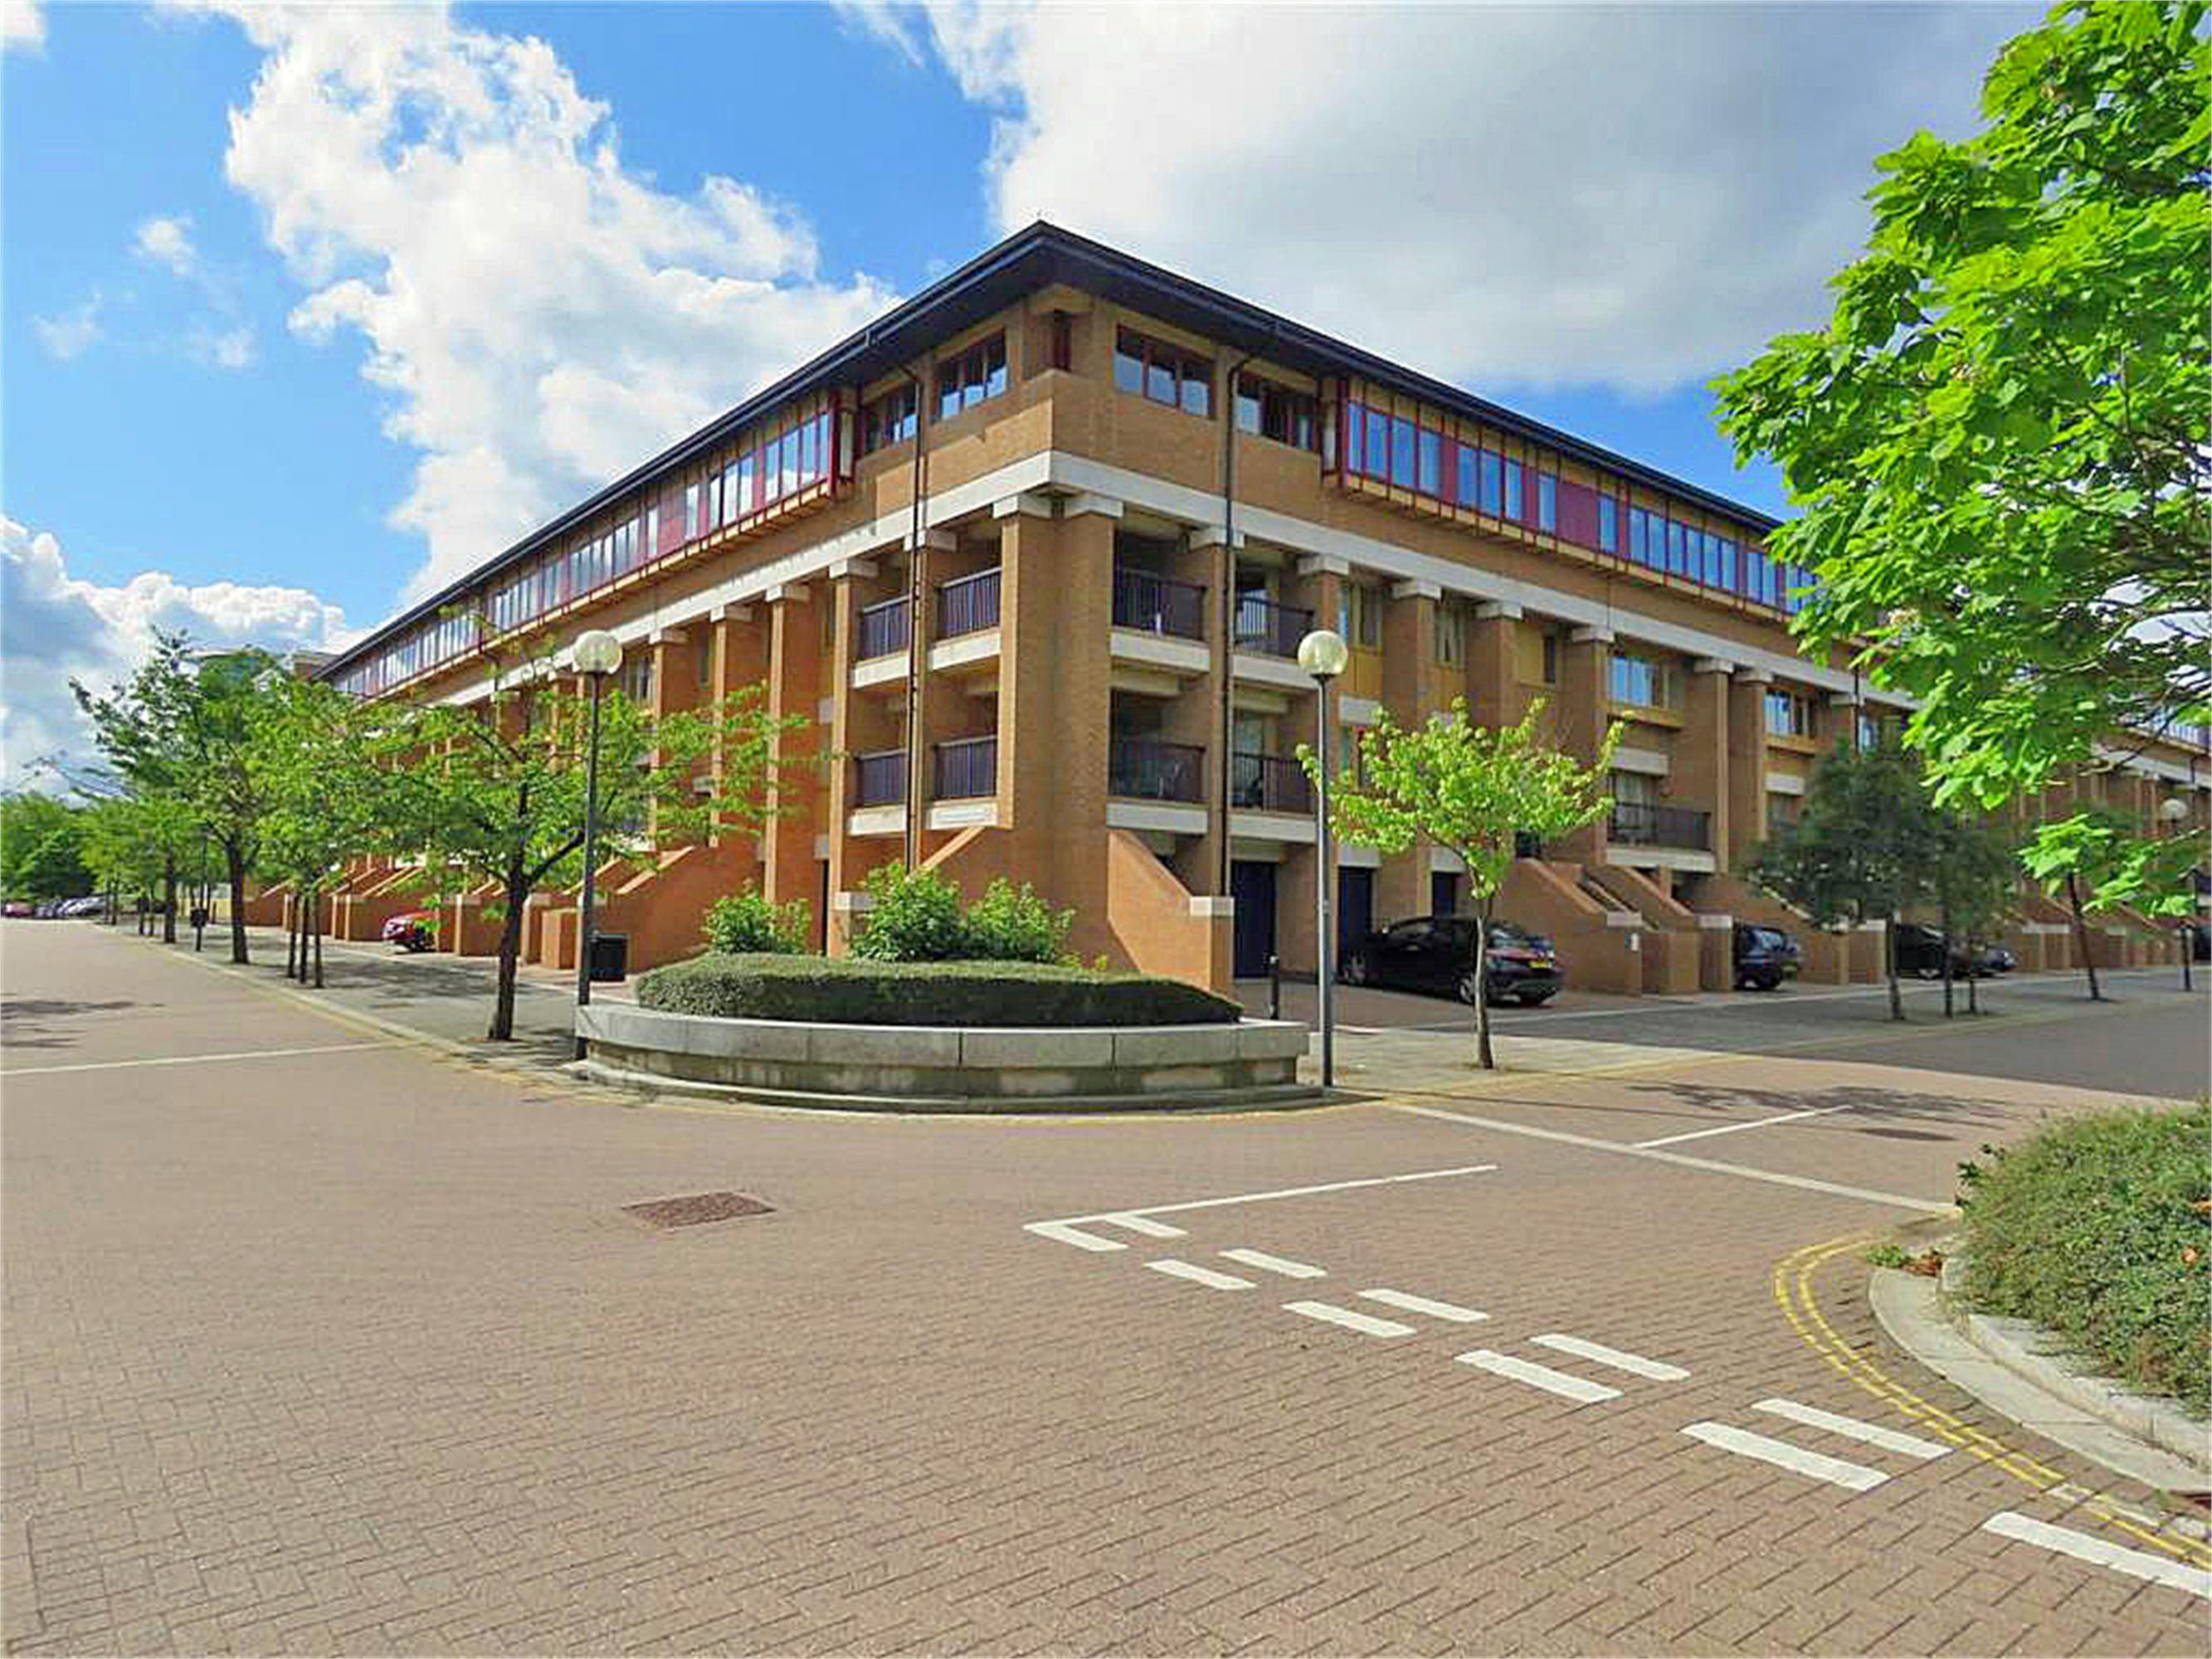 North Thirteenth Street, Milton Keynes, Buckinghamshire Image